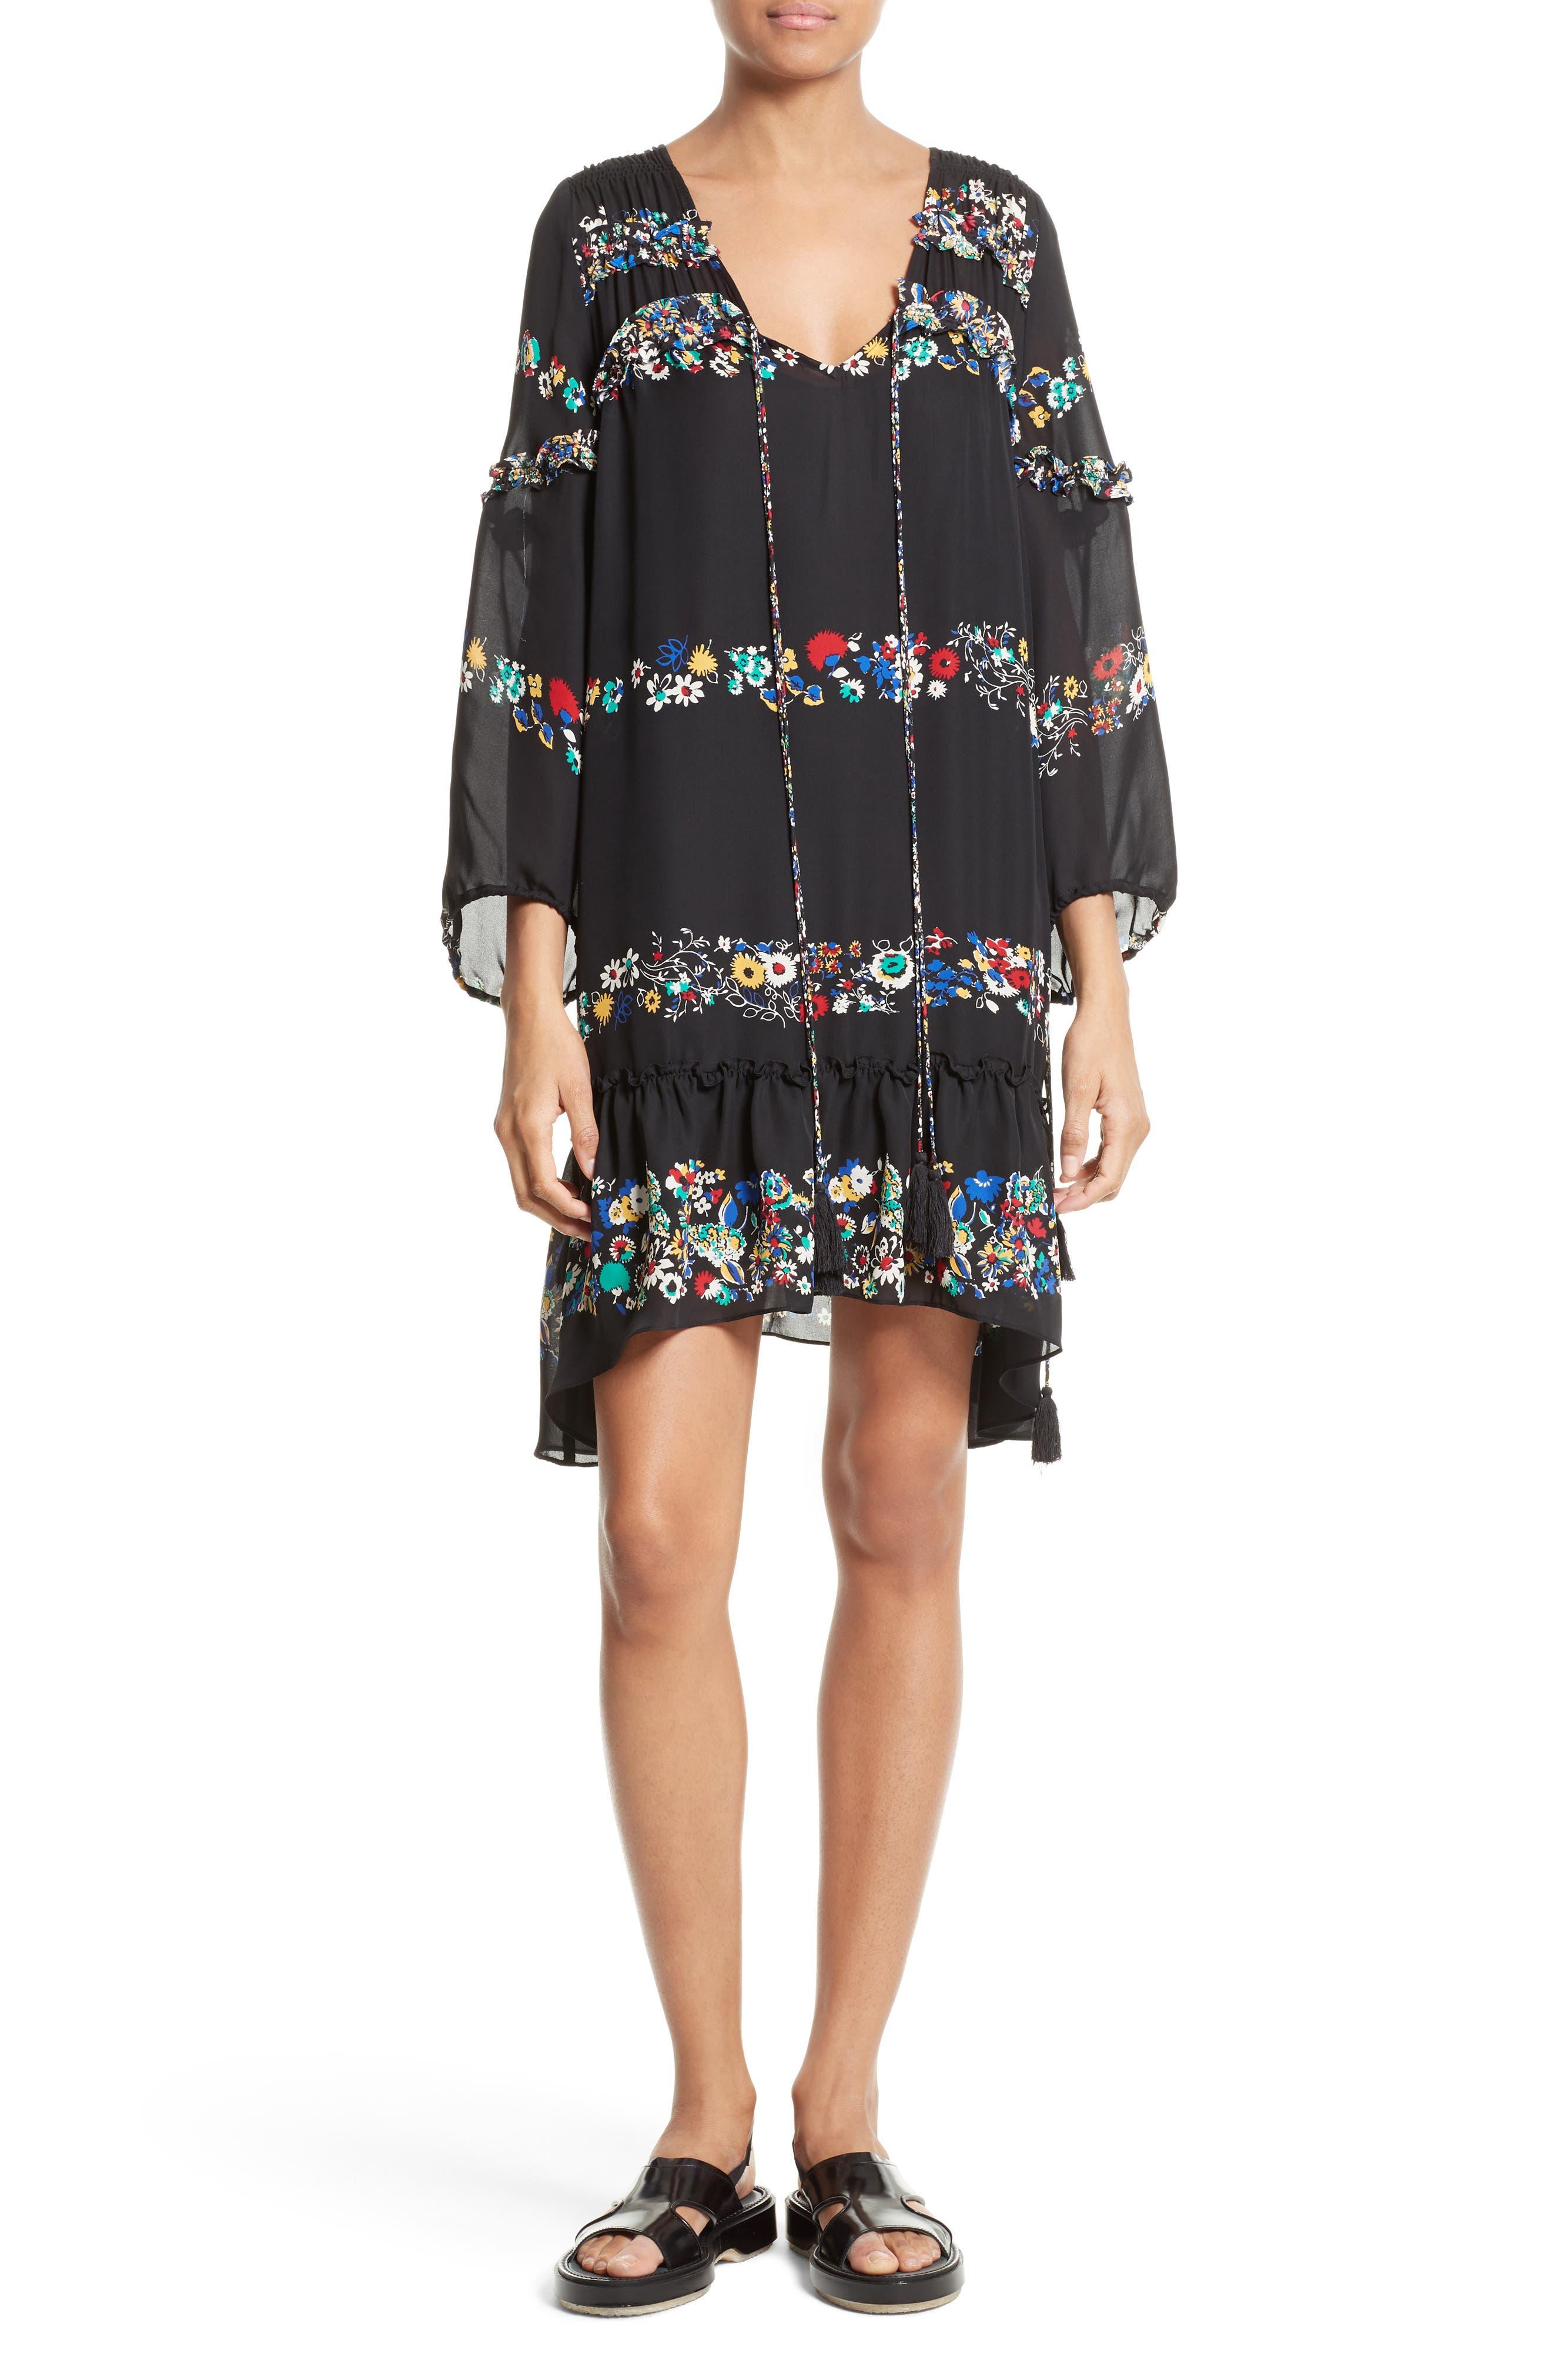 Alternate Image 1 Selected - Derek Lam 10 Crosby Floral Stripe Ruffle Silk Dress